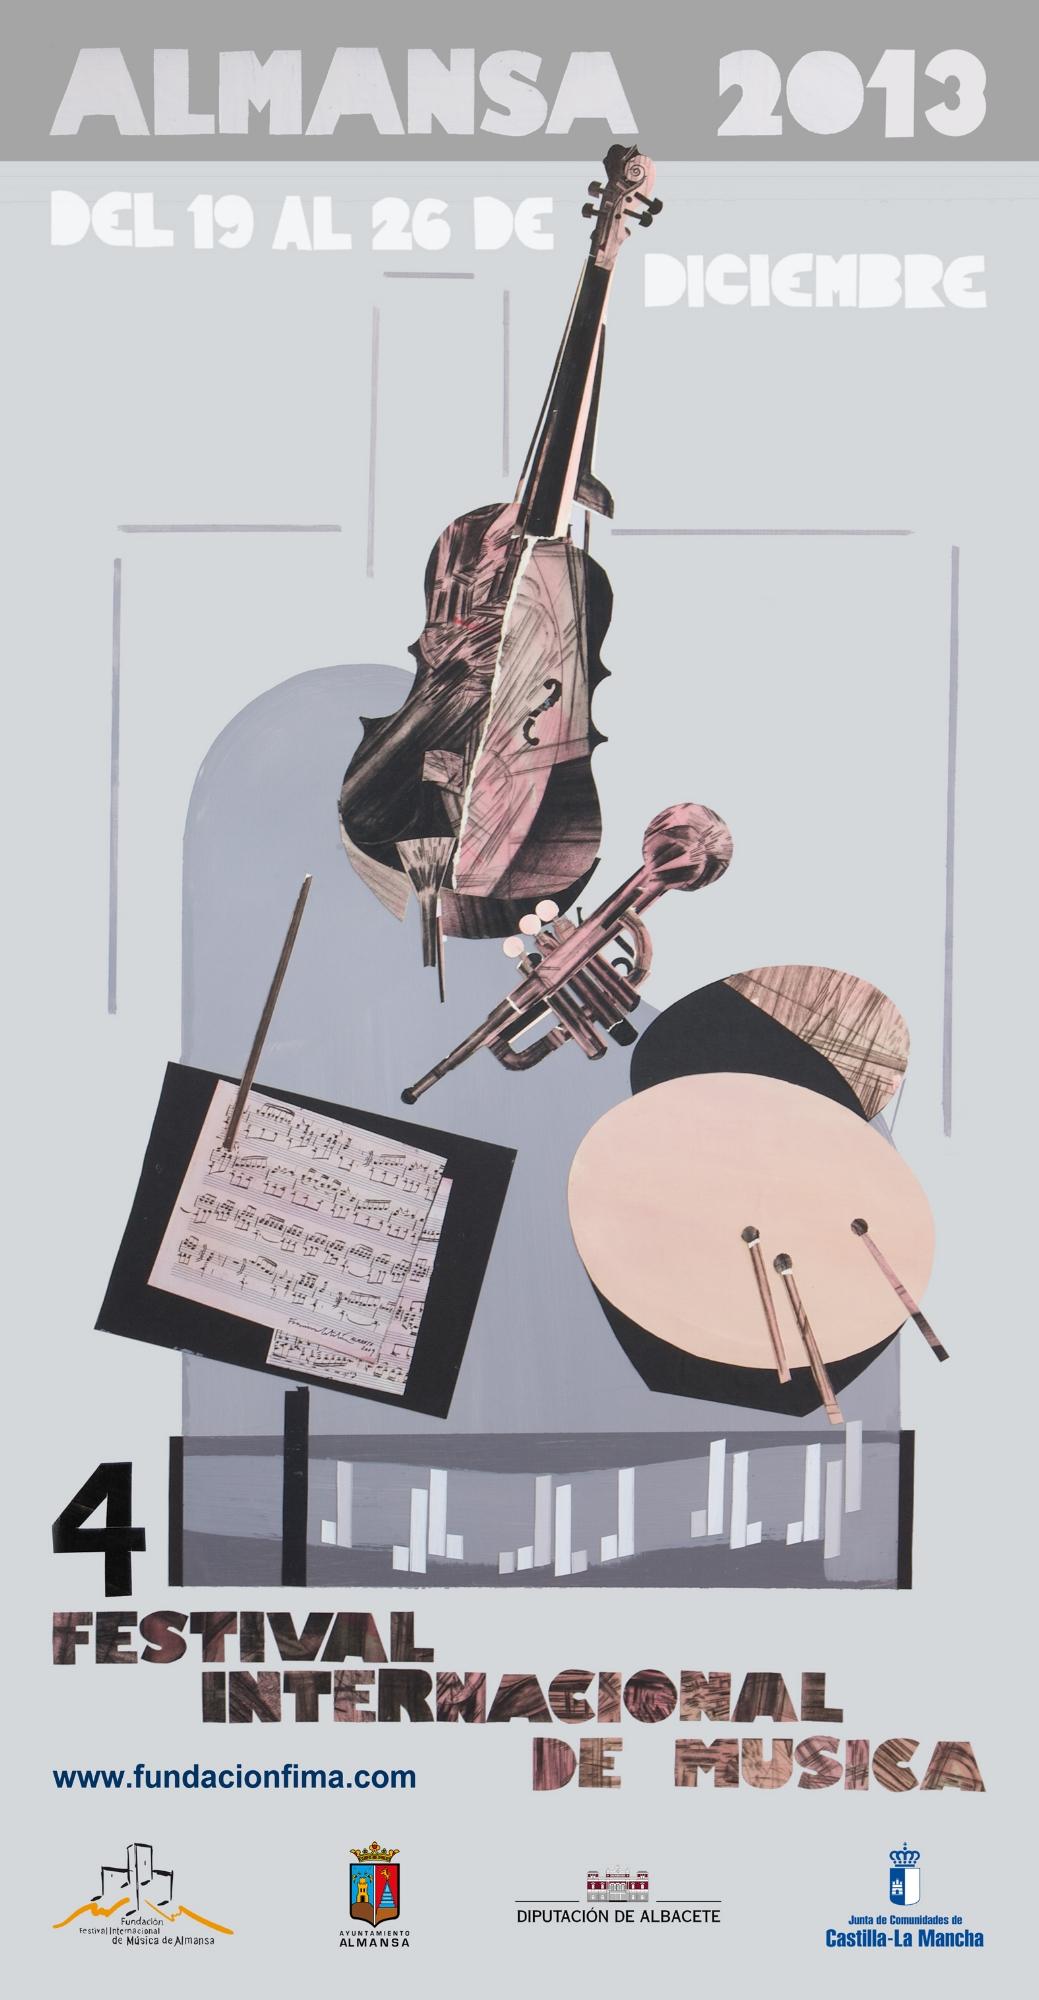 Cartel Festival de Musica definitivo.jpg